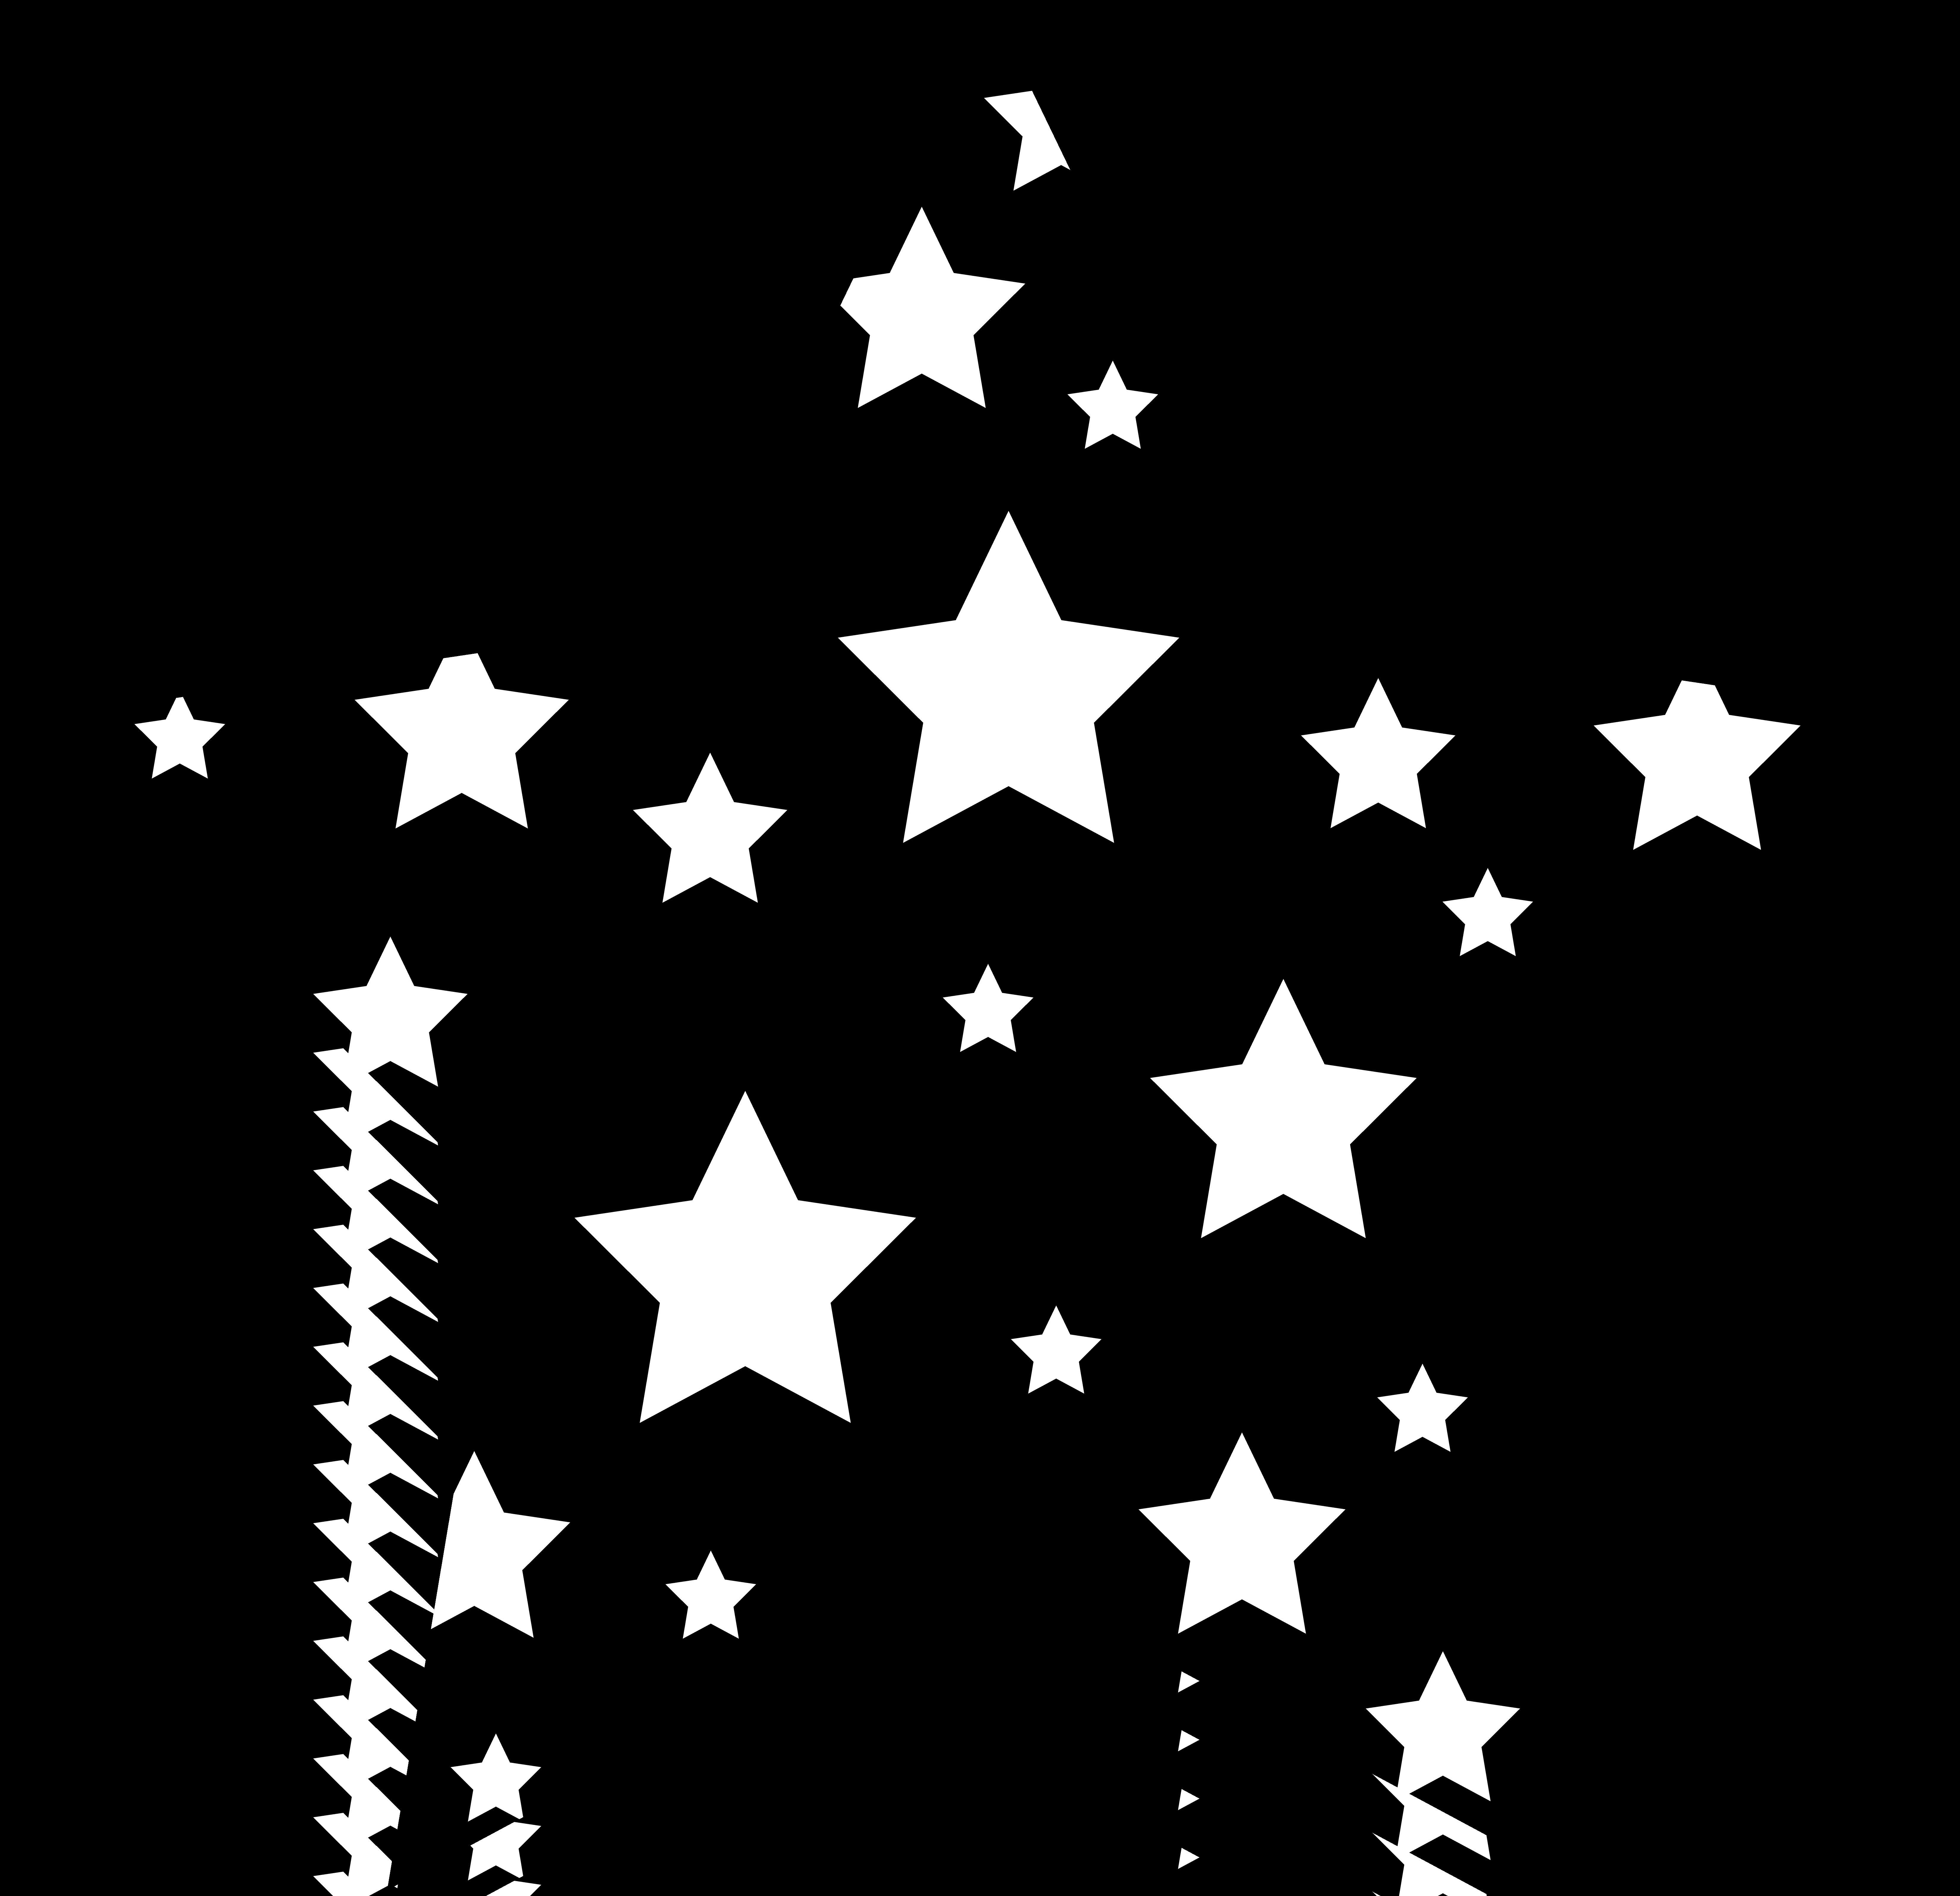 Explosions clipart border Clip Art Free Star Clip